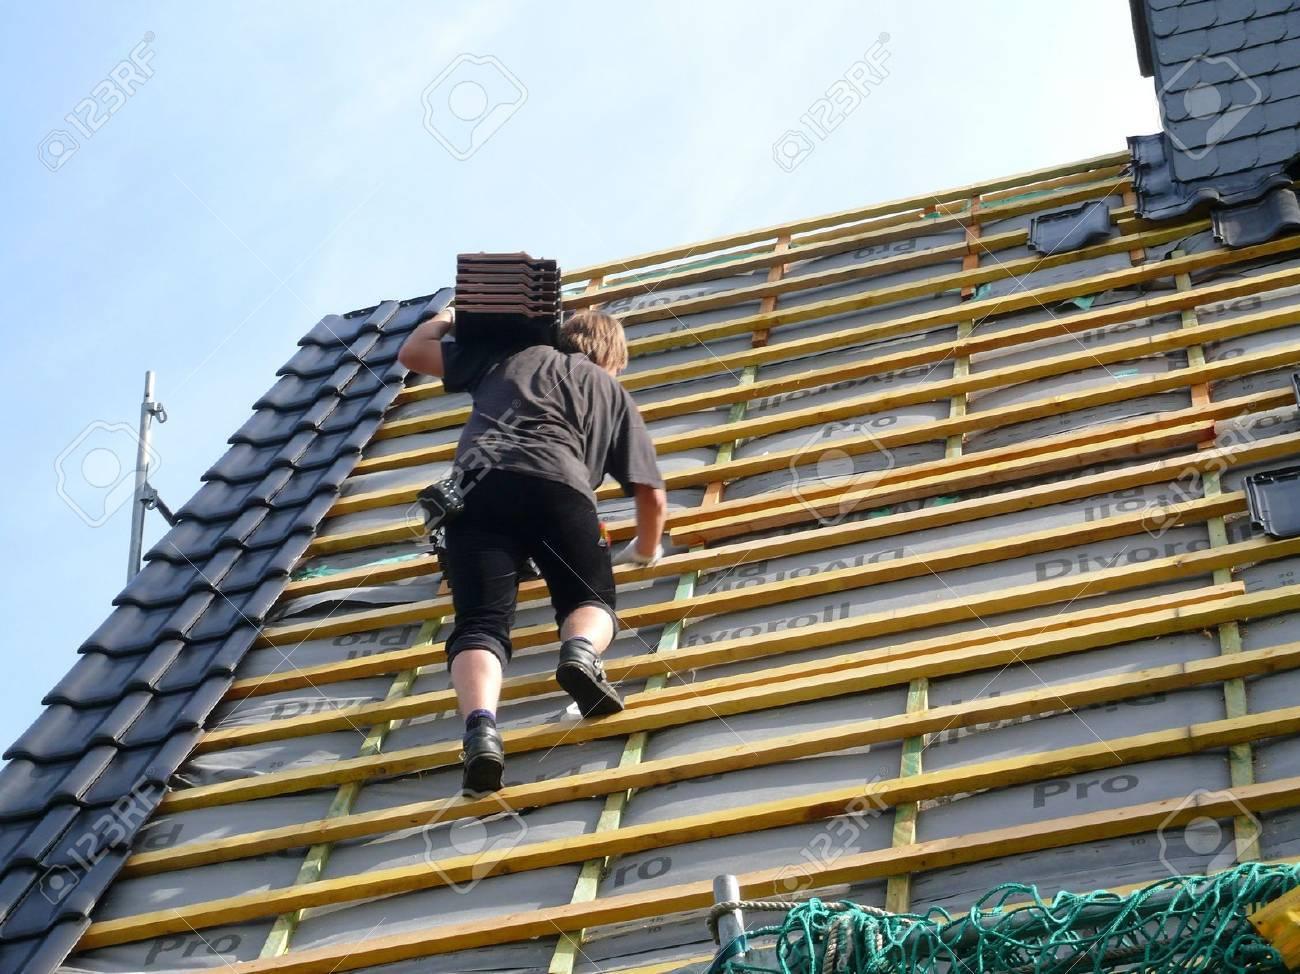 roof renovation Stock Photo - 5231444